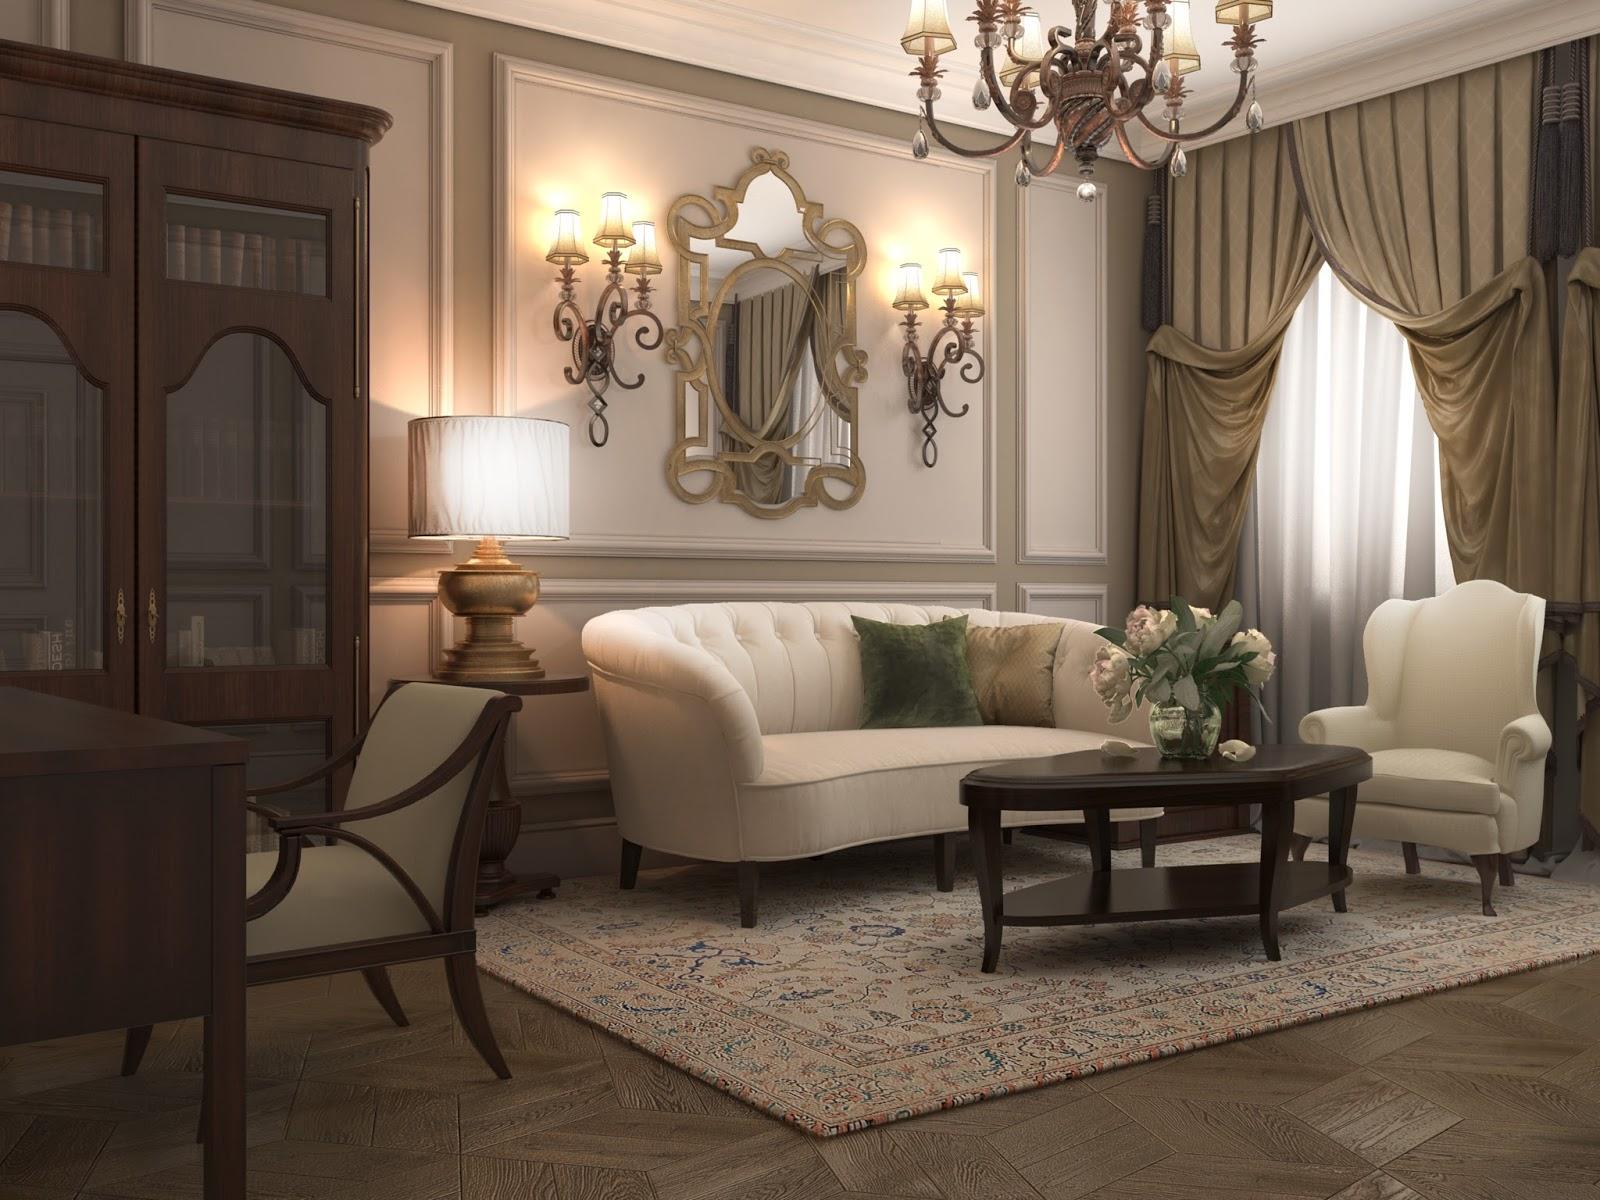 Darya girina interior design march 2015 - Darya Girina Interior Design Interior Design Of Lux Apartments Of The Bariatinsky Palace Contemporary Classic Vision Of Interiors